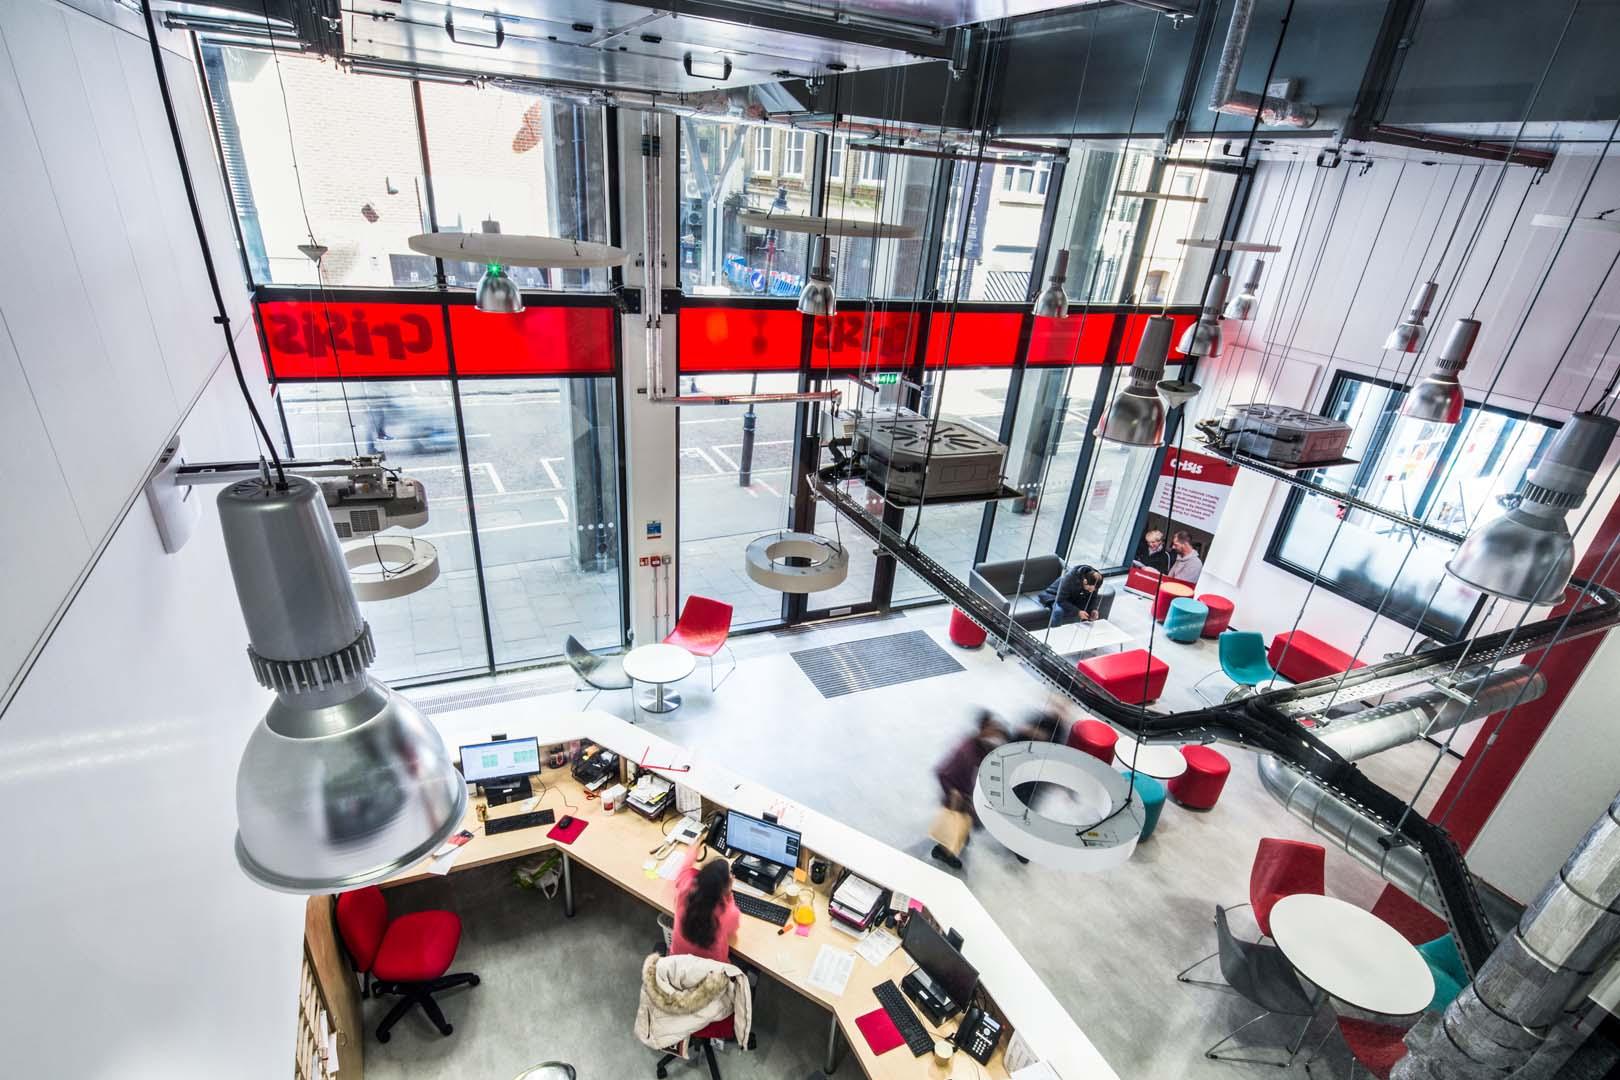 Crisis Skylight Centre, Croydon